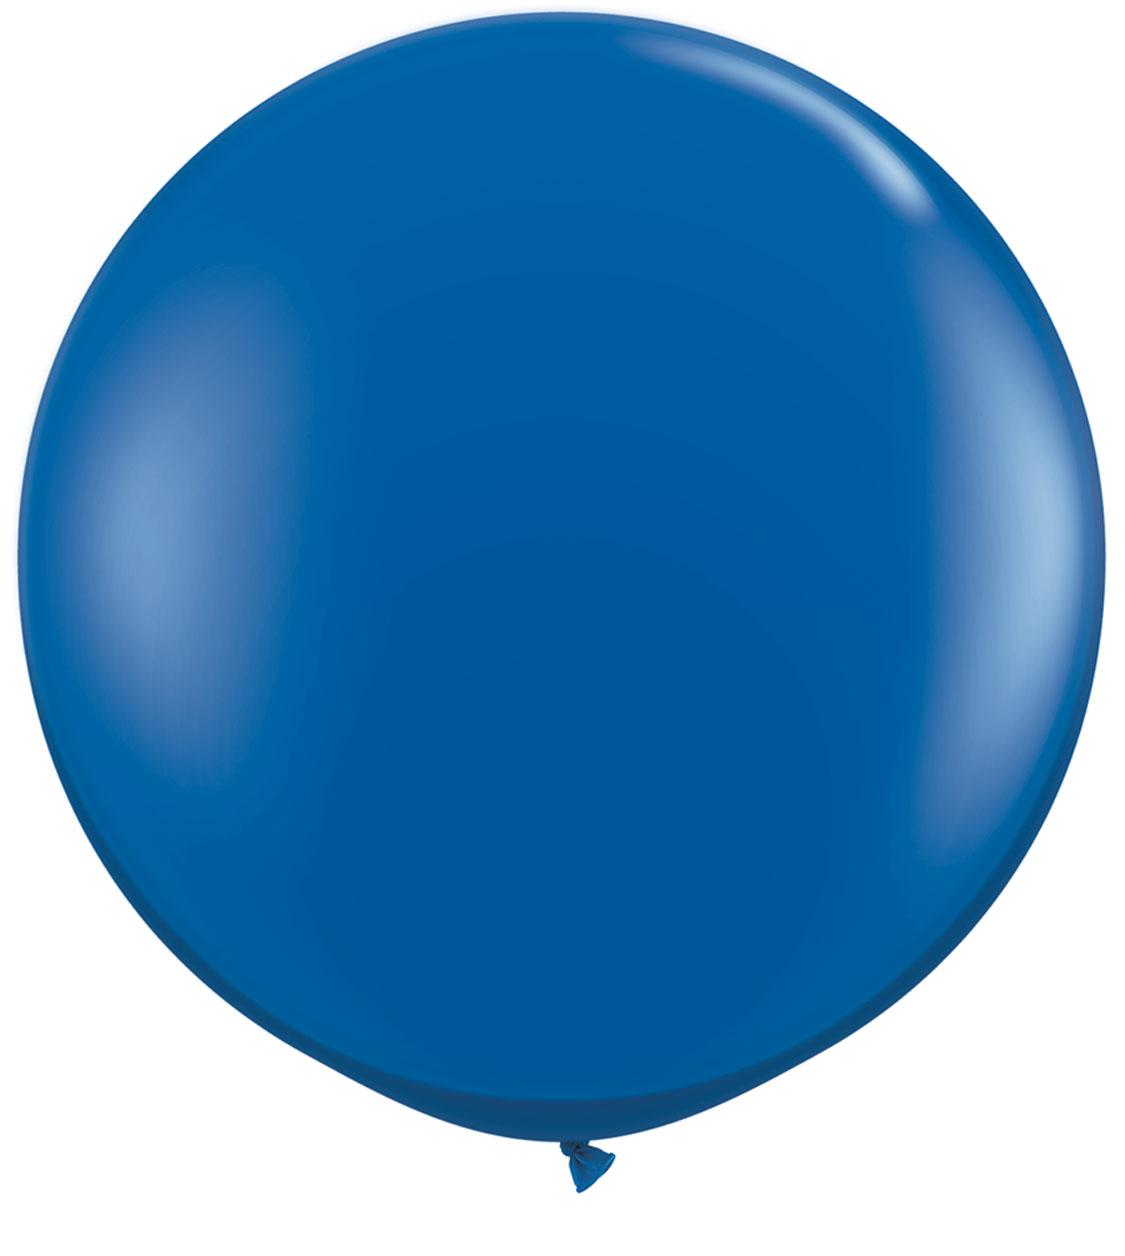 Circle clipart balloon Balloon Clipart Free Panda Clipart